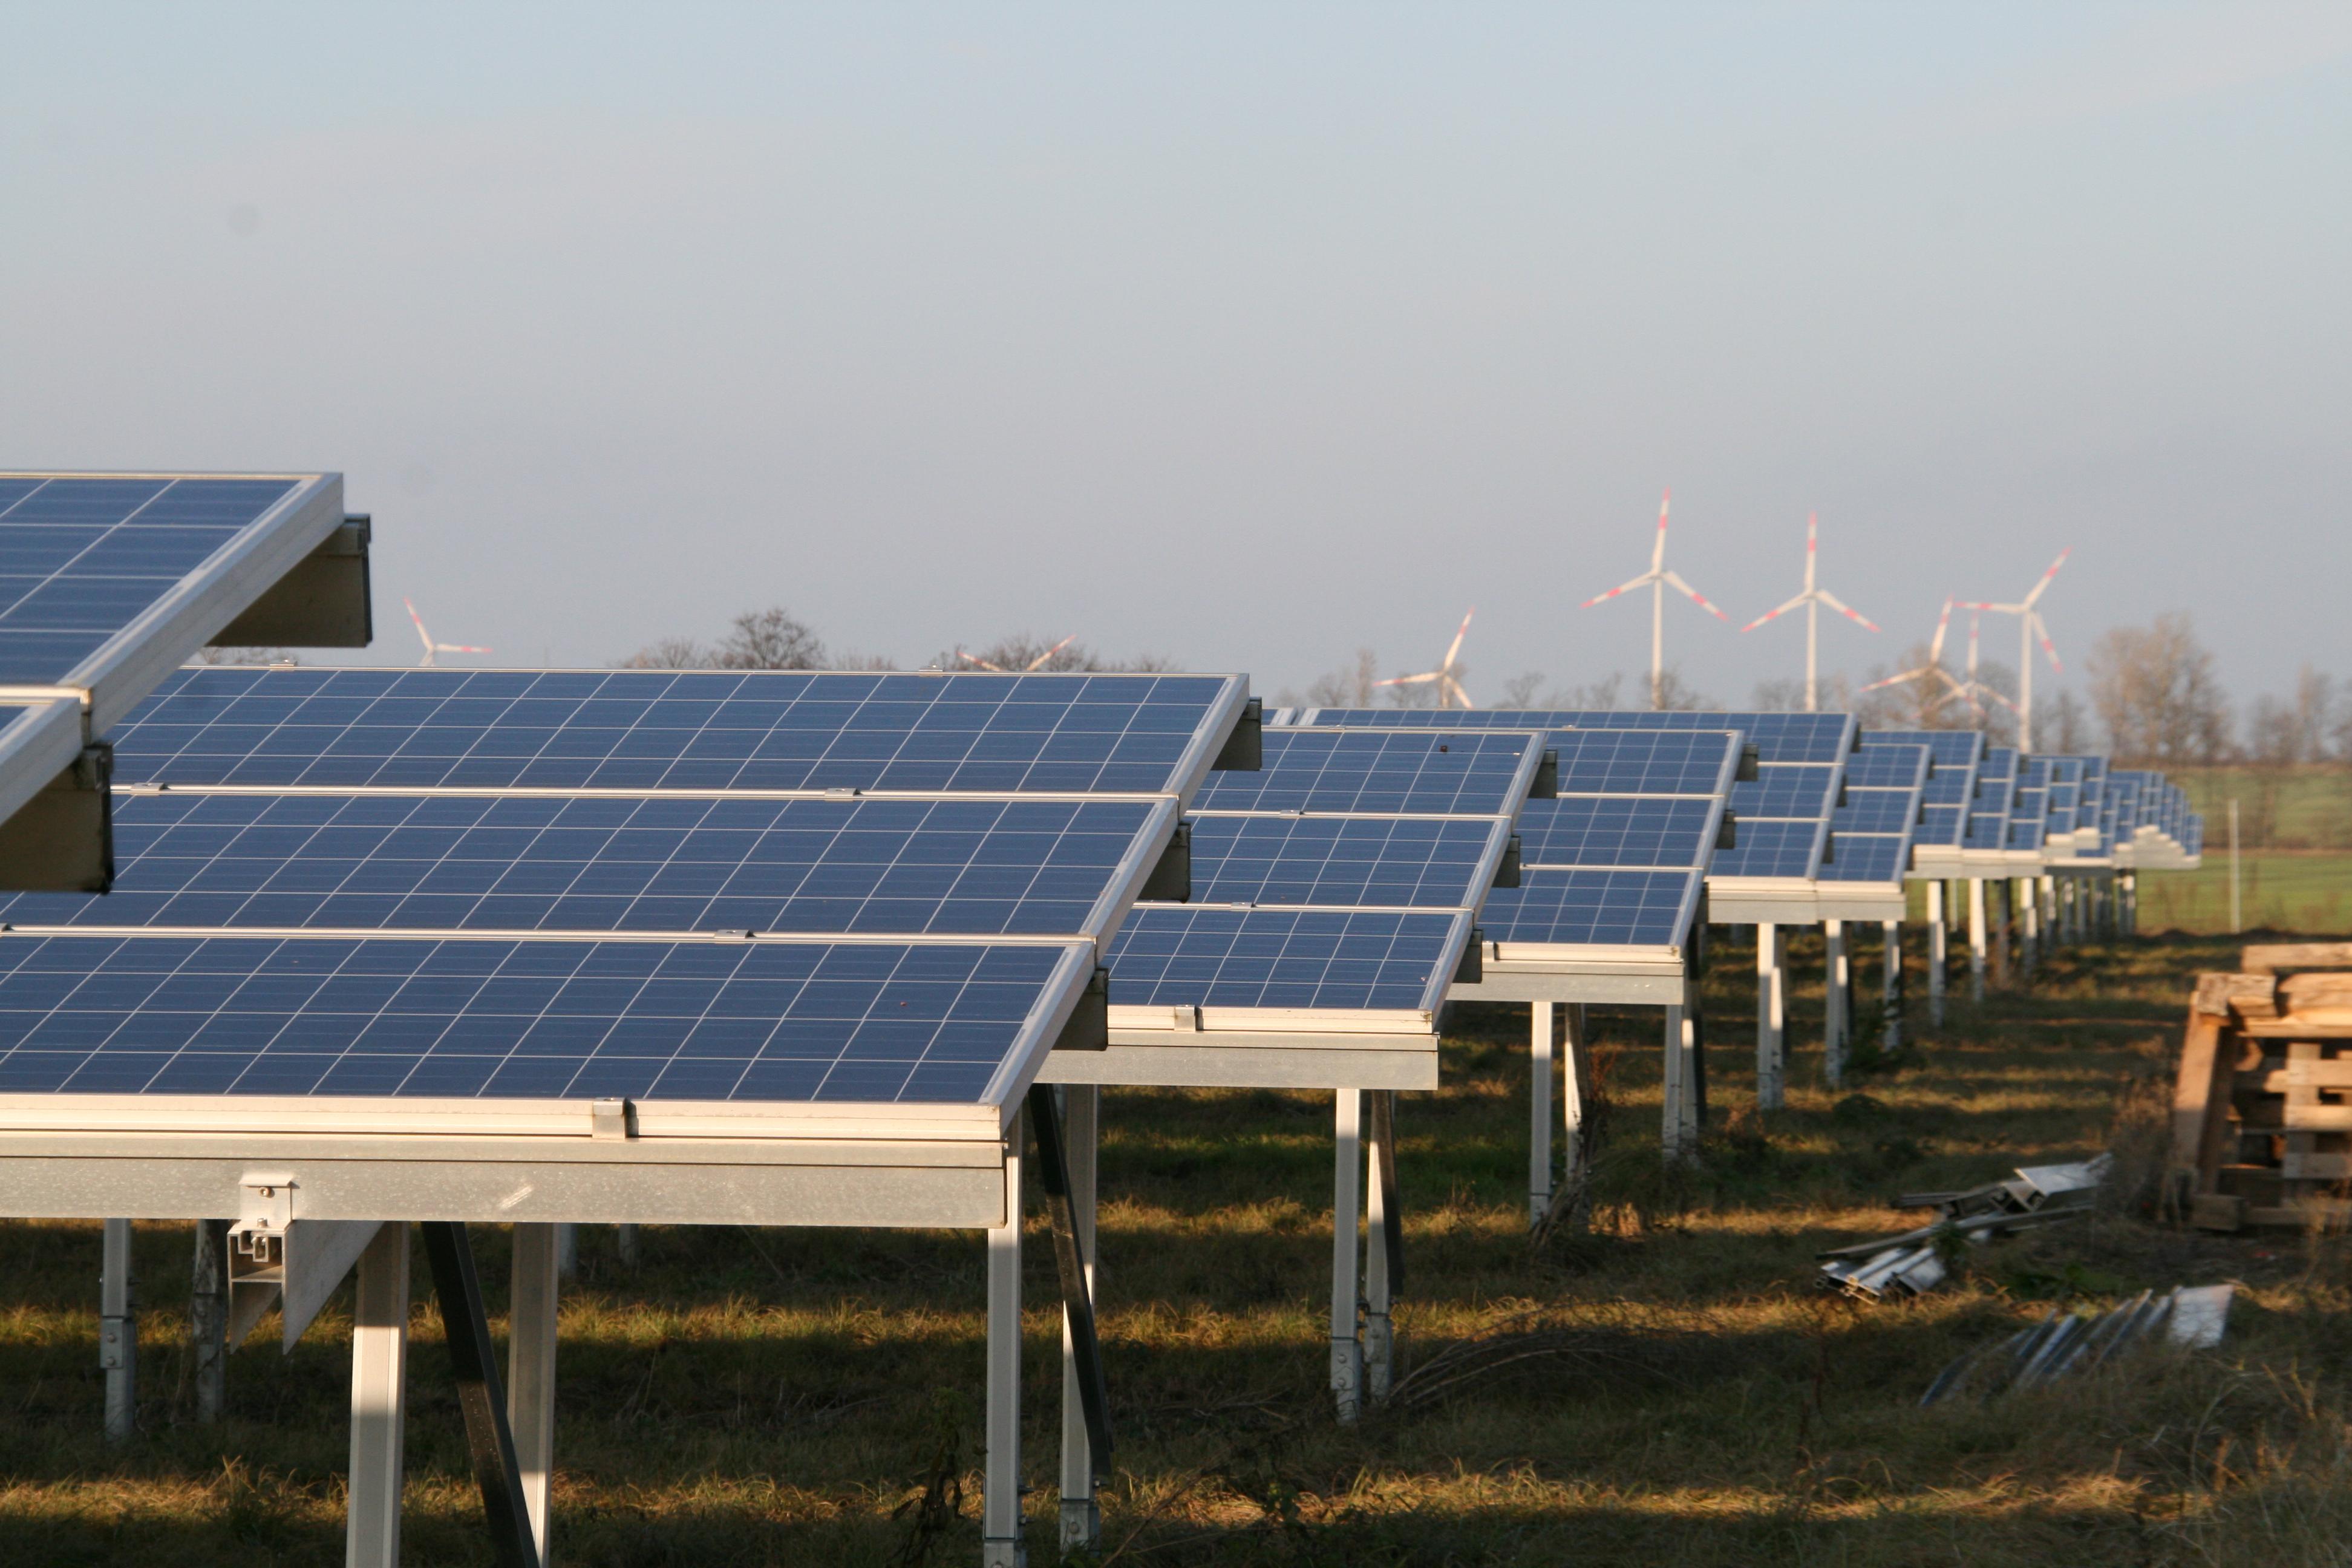 Solarpark im Havelland, Foto: Andreas Kühl